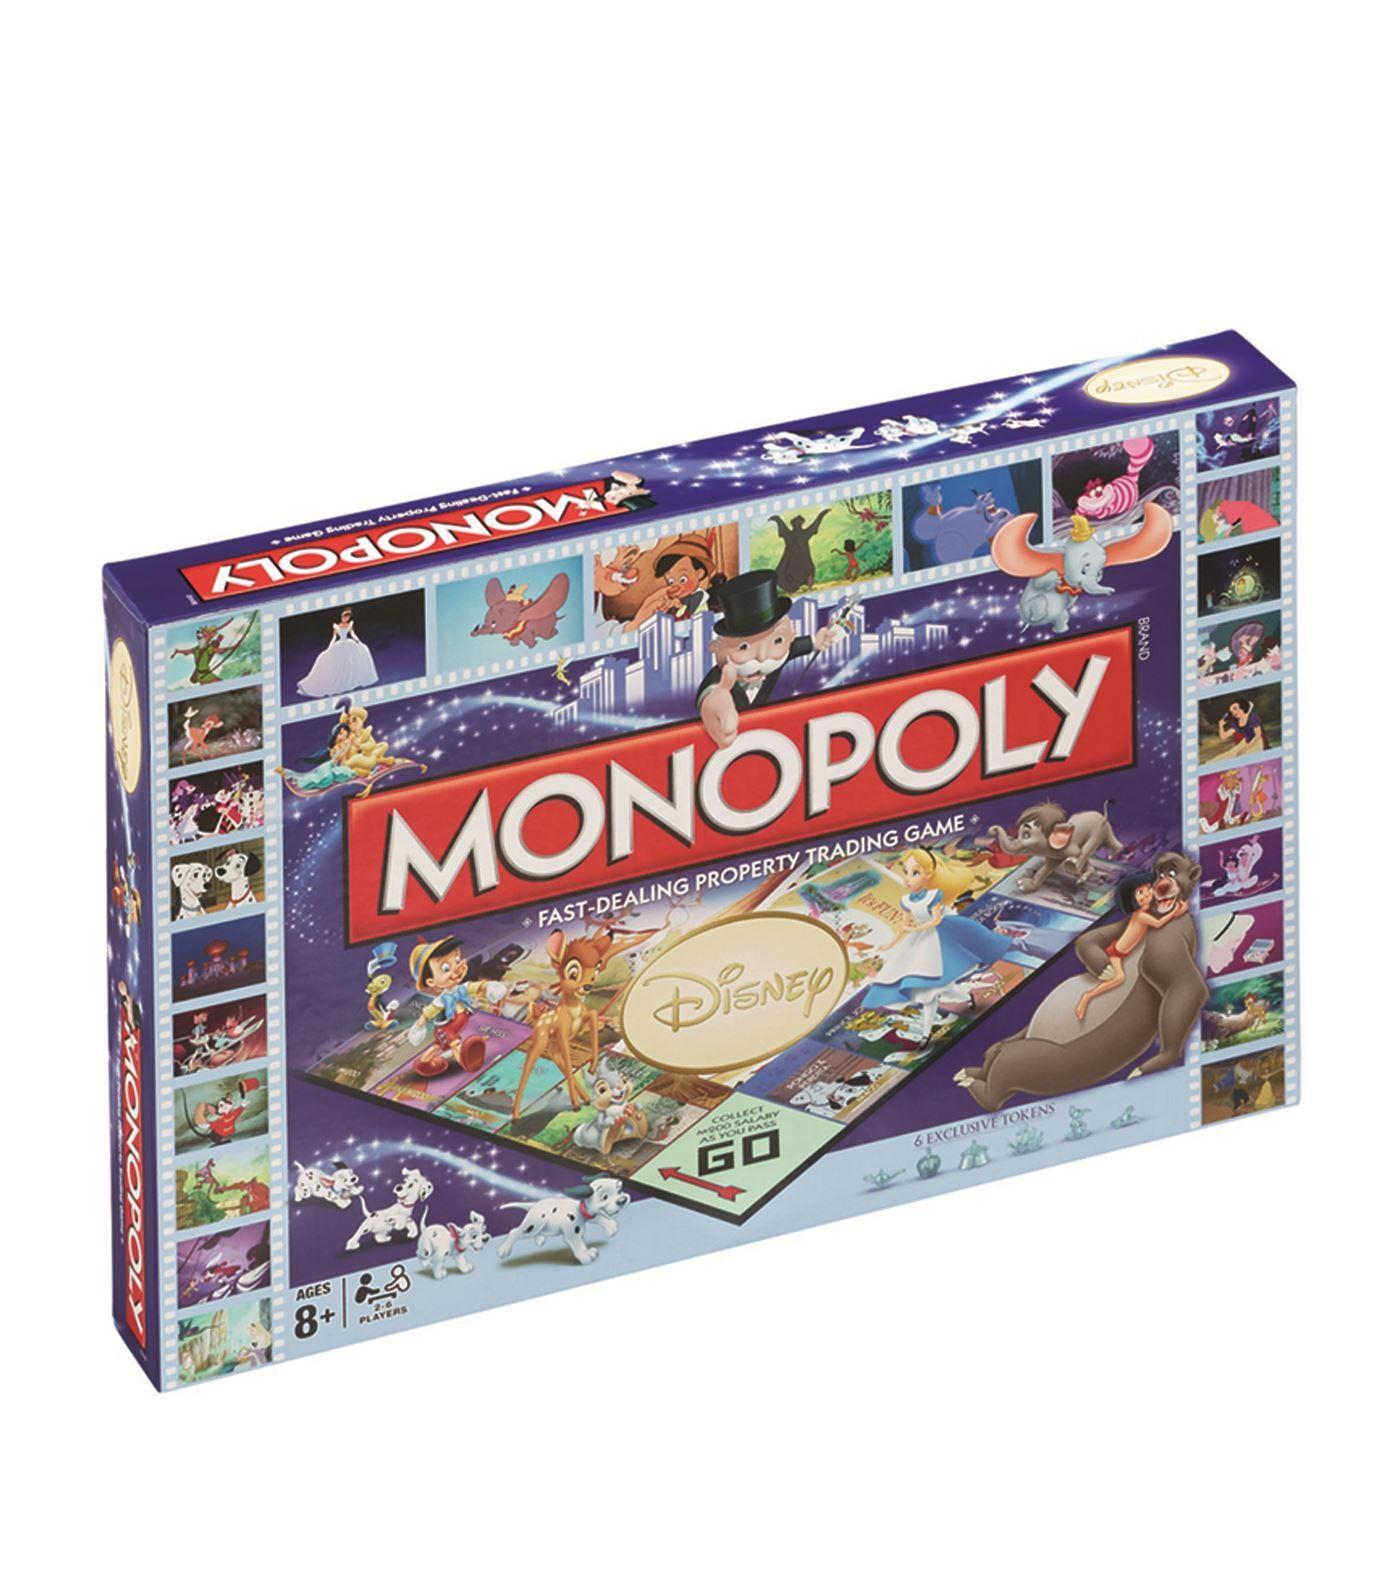 Disney Disney Classic Monopoly | Harrods.com | CHRISTMAS GIFTS FOR ...